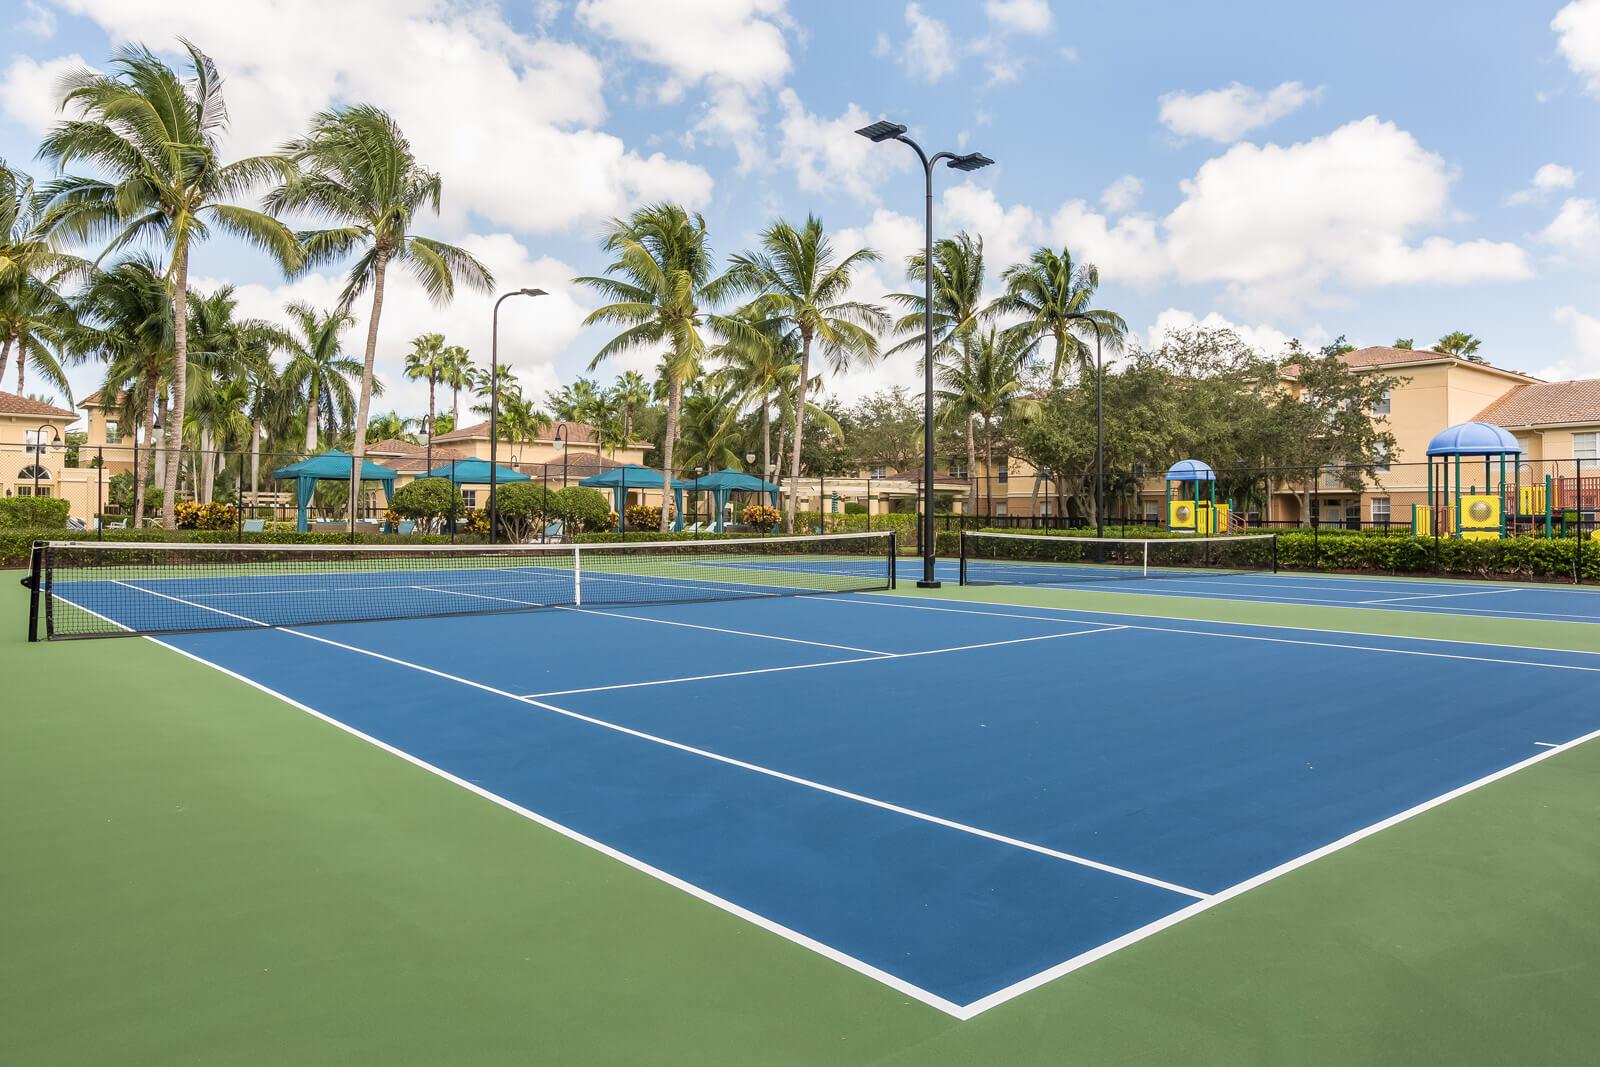 Lighted, Regulation Tennis Courts at Windsor at Miramar, Florida, 33027